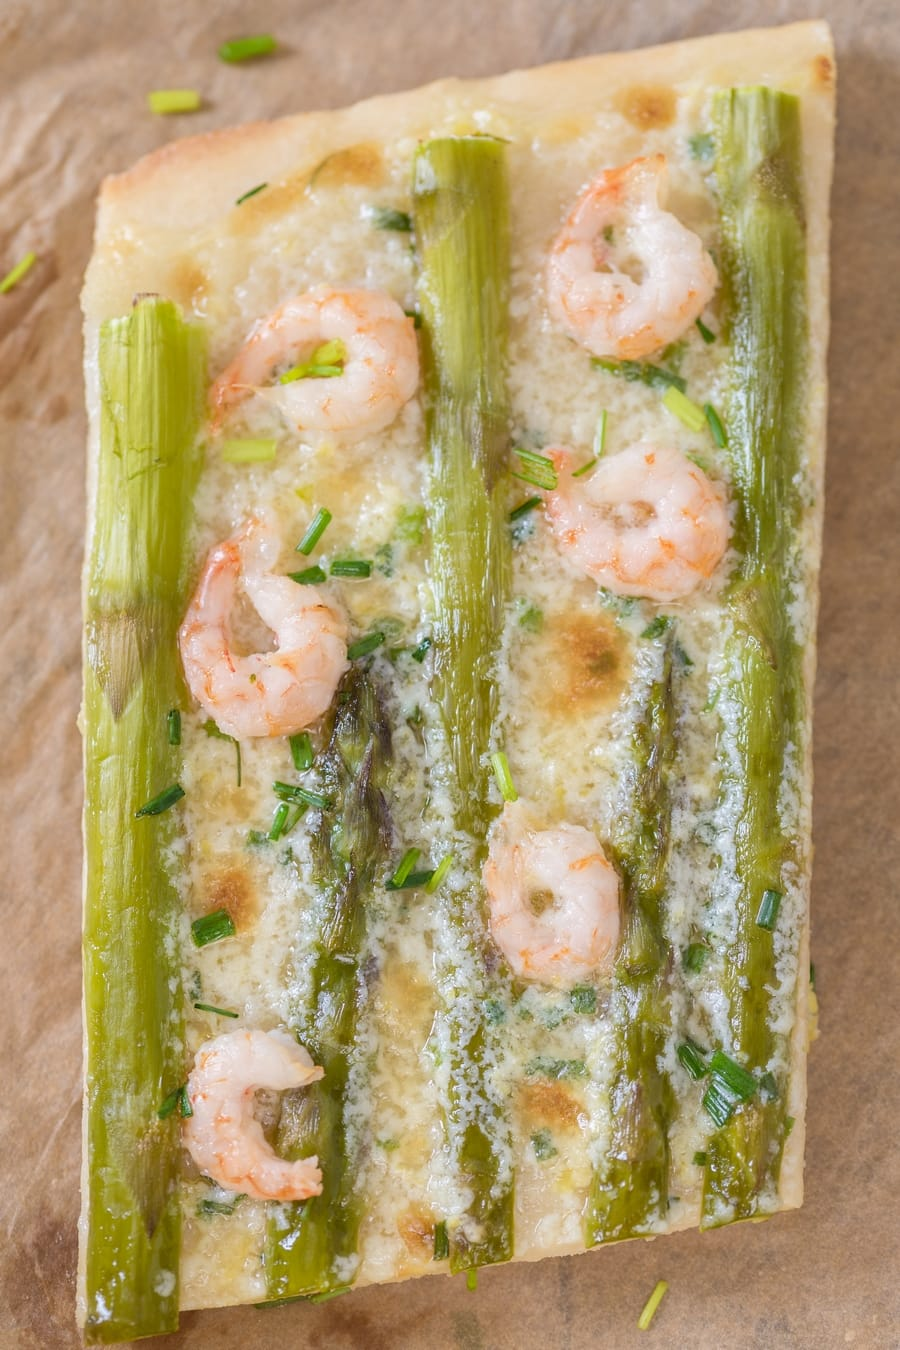 Slice of shrimp asparagus flatbread with zesty mascarpone sauce.